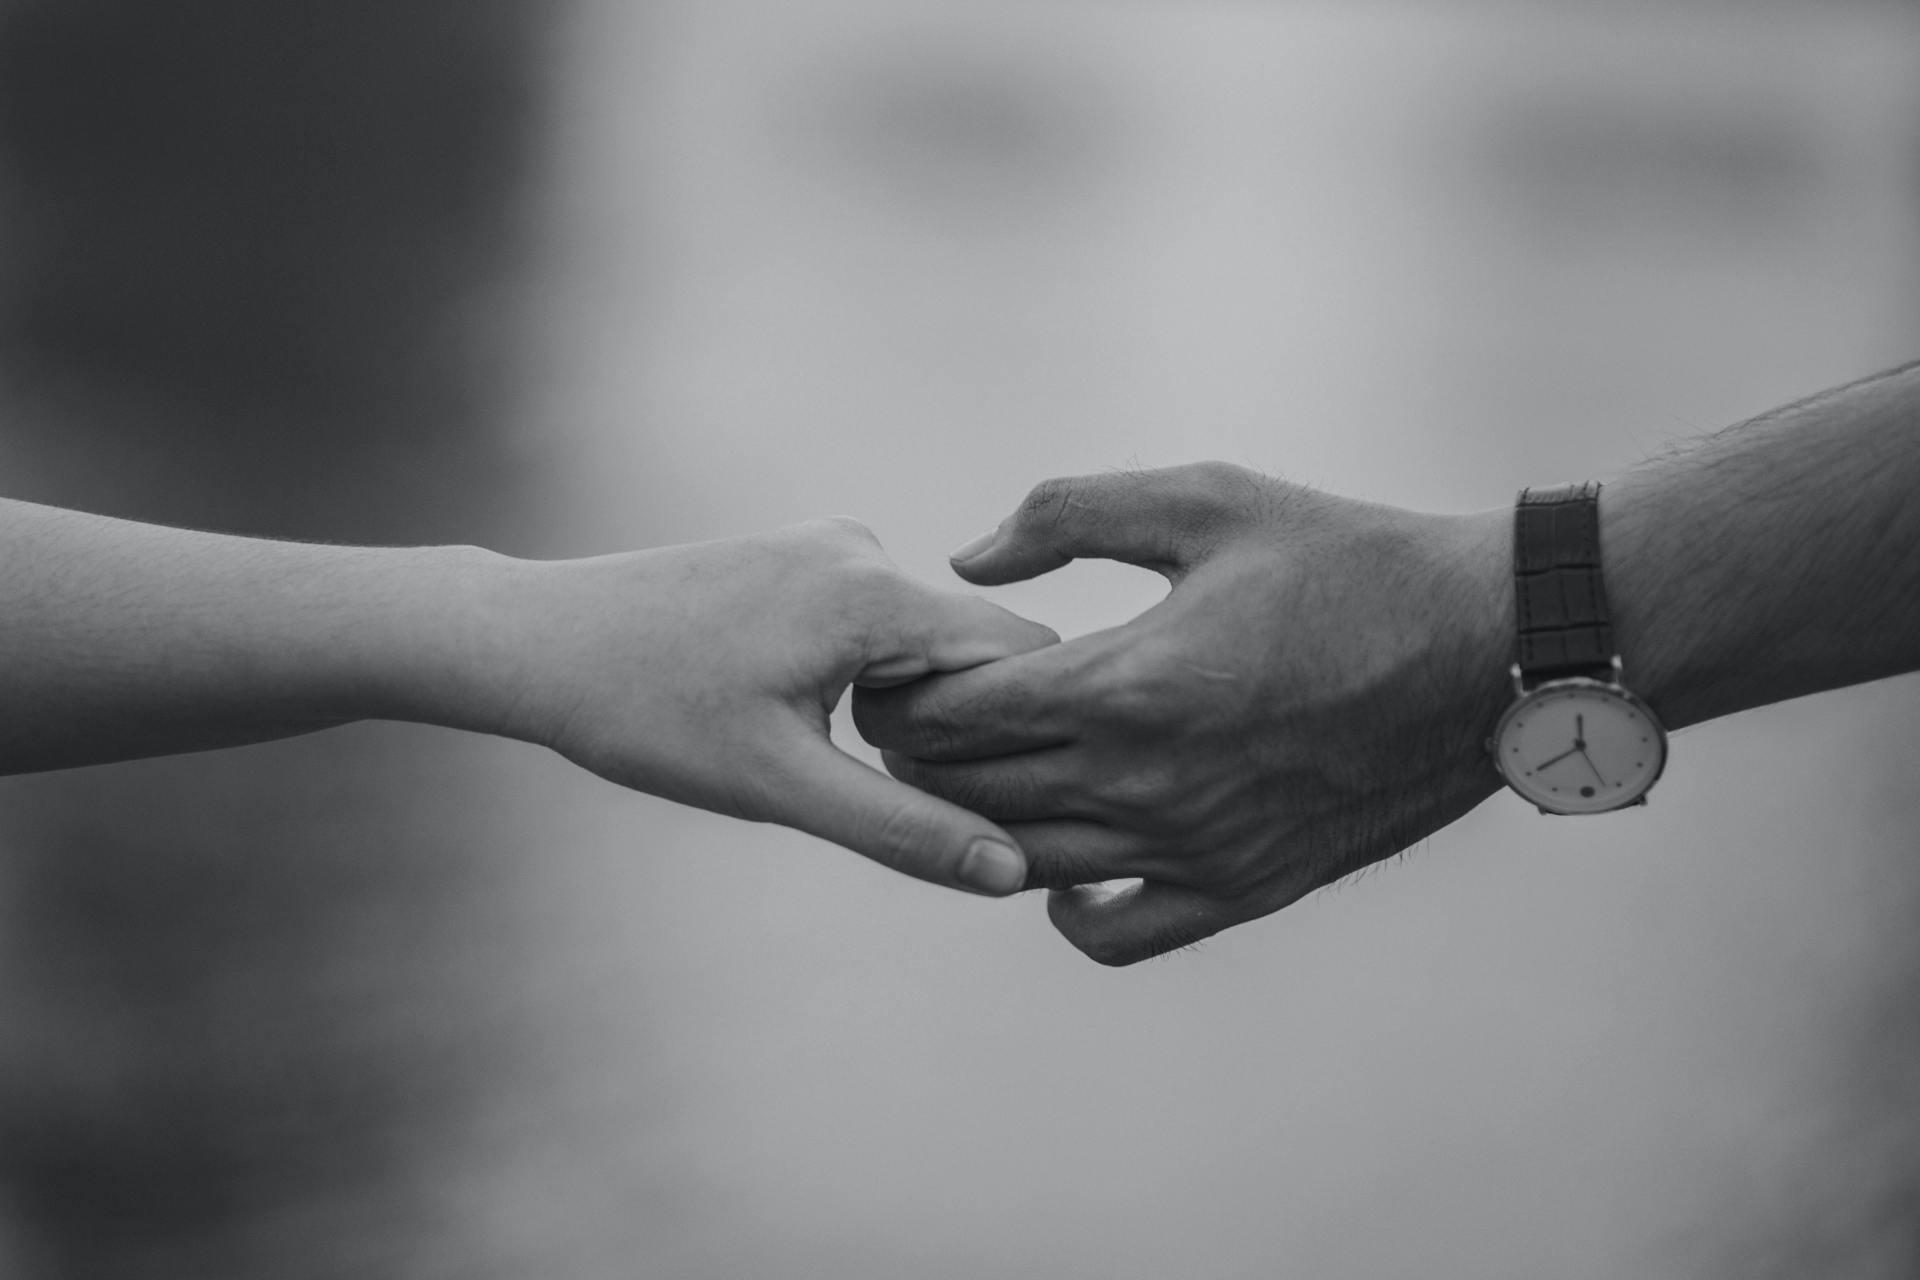 Monochrome Photo pf Couple Holding Hands